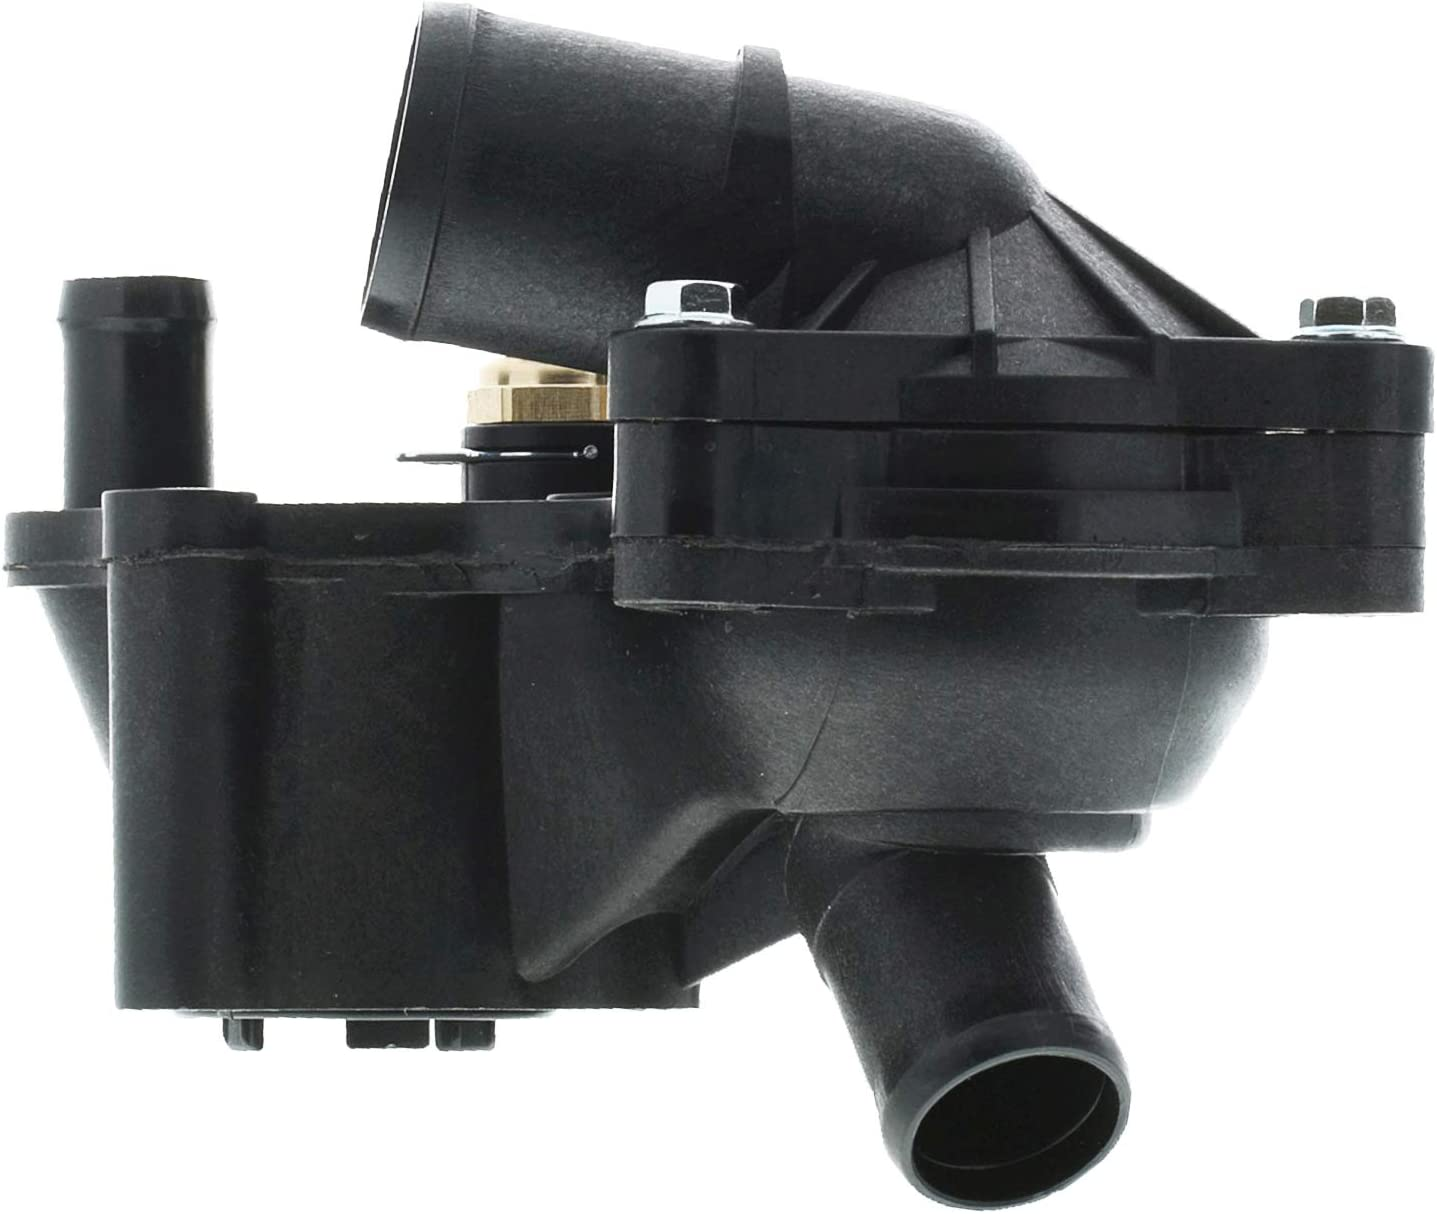 Mazda B4000 Ranger MotoRad TA2062S Thermostat Housing Assembly Fits select Ford Explorer Sport Trac